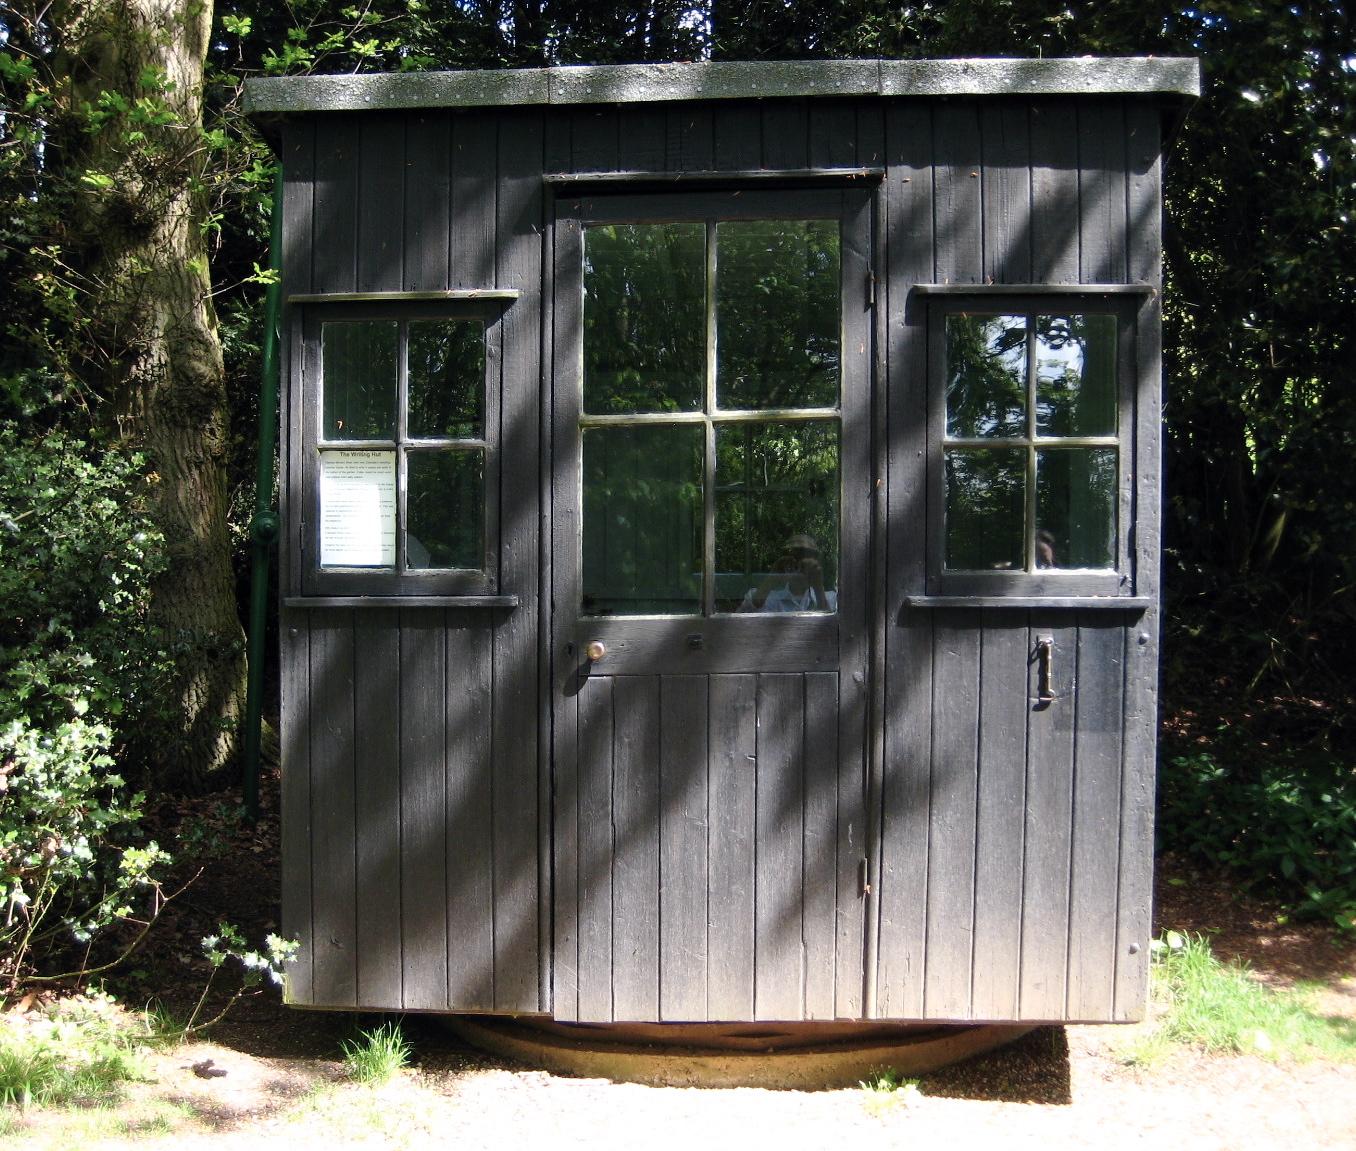 George Bernard Shaw's rotating writing hut